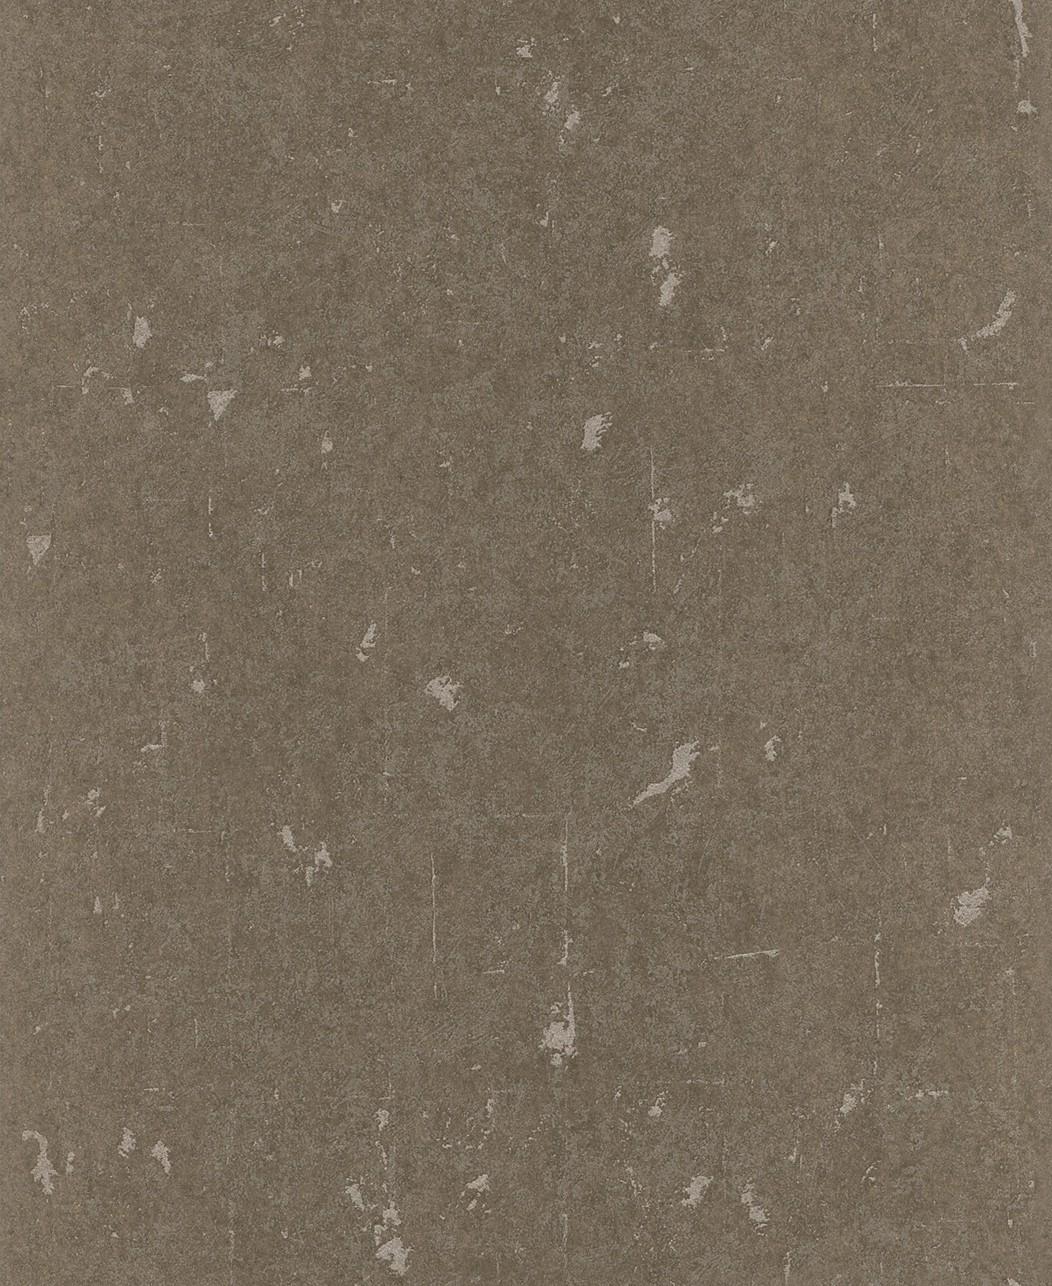 rasch textil tapete tintura vintage braun 227283. Black Bedroom Furniture Sets. Home Design Ideas